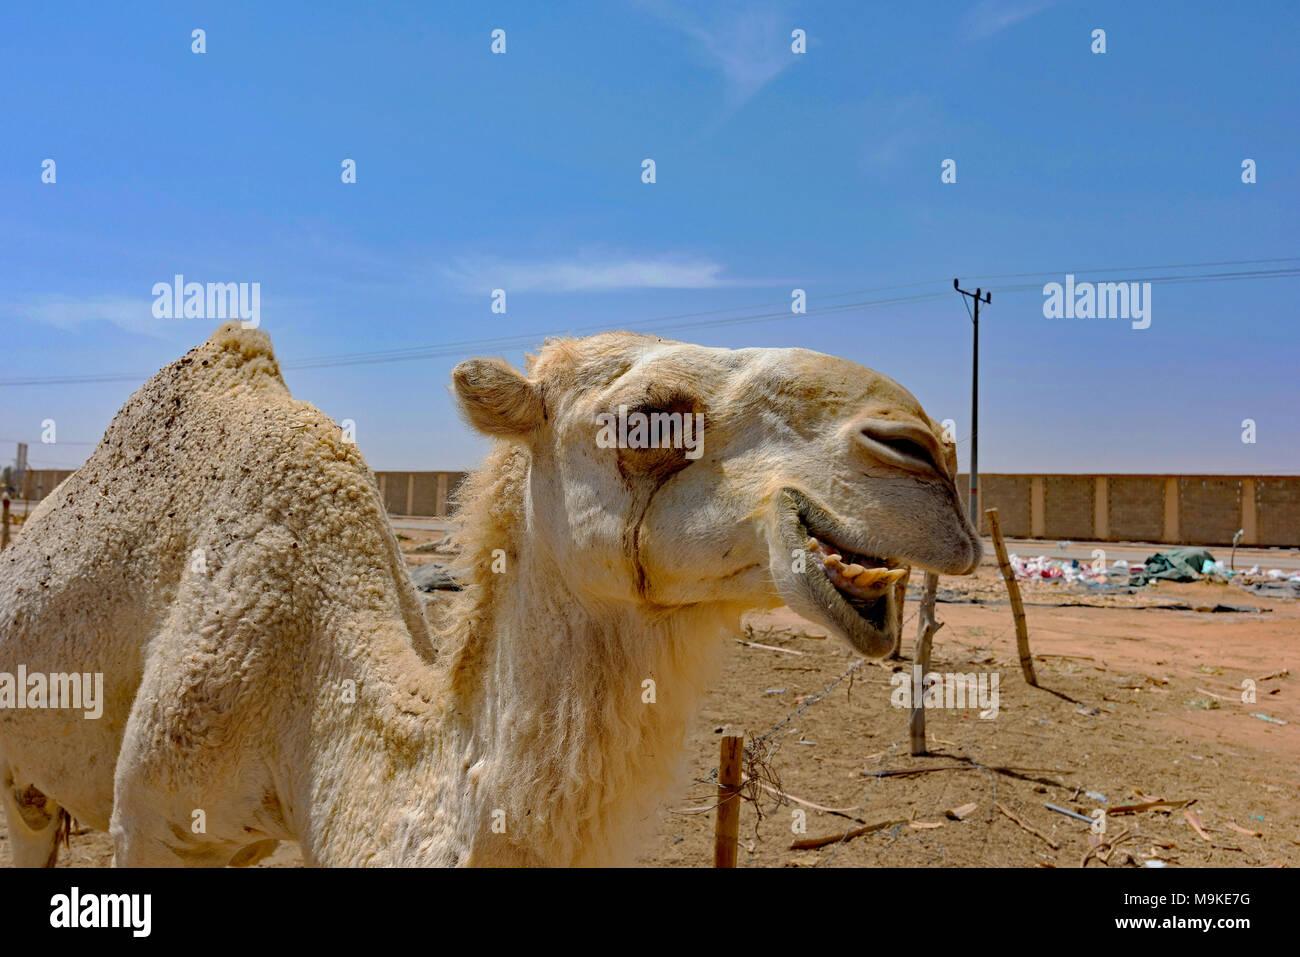 Close-ups of camels for sale near Riyadh, Saudi Arabia. - Stock Image